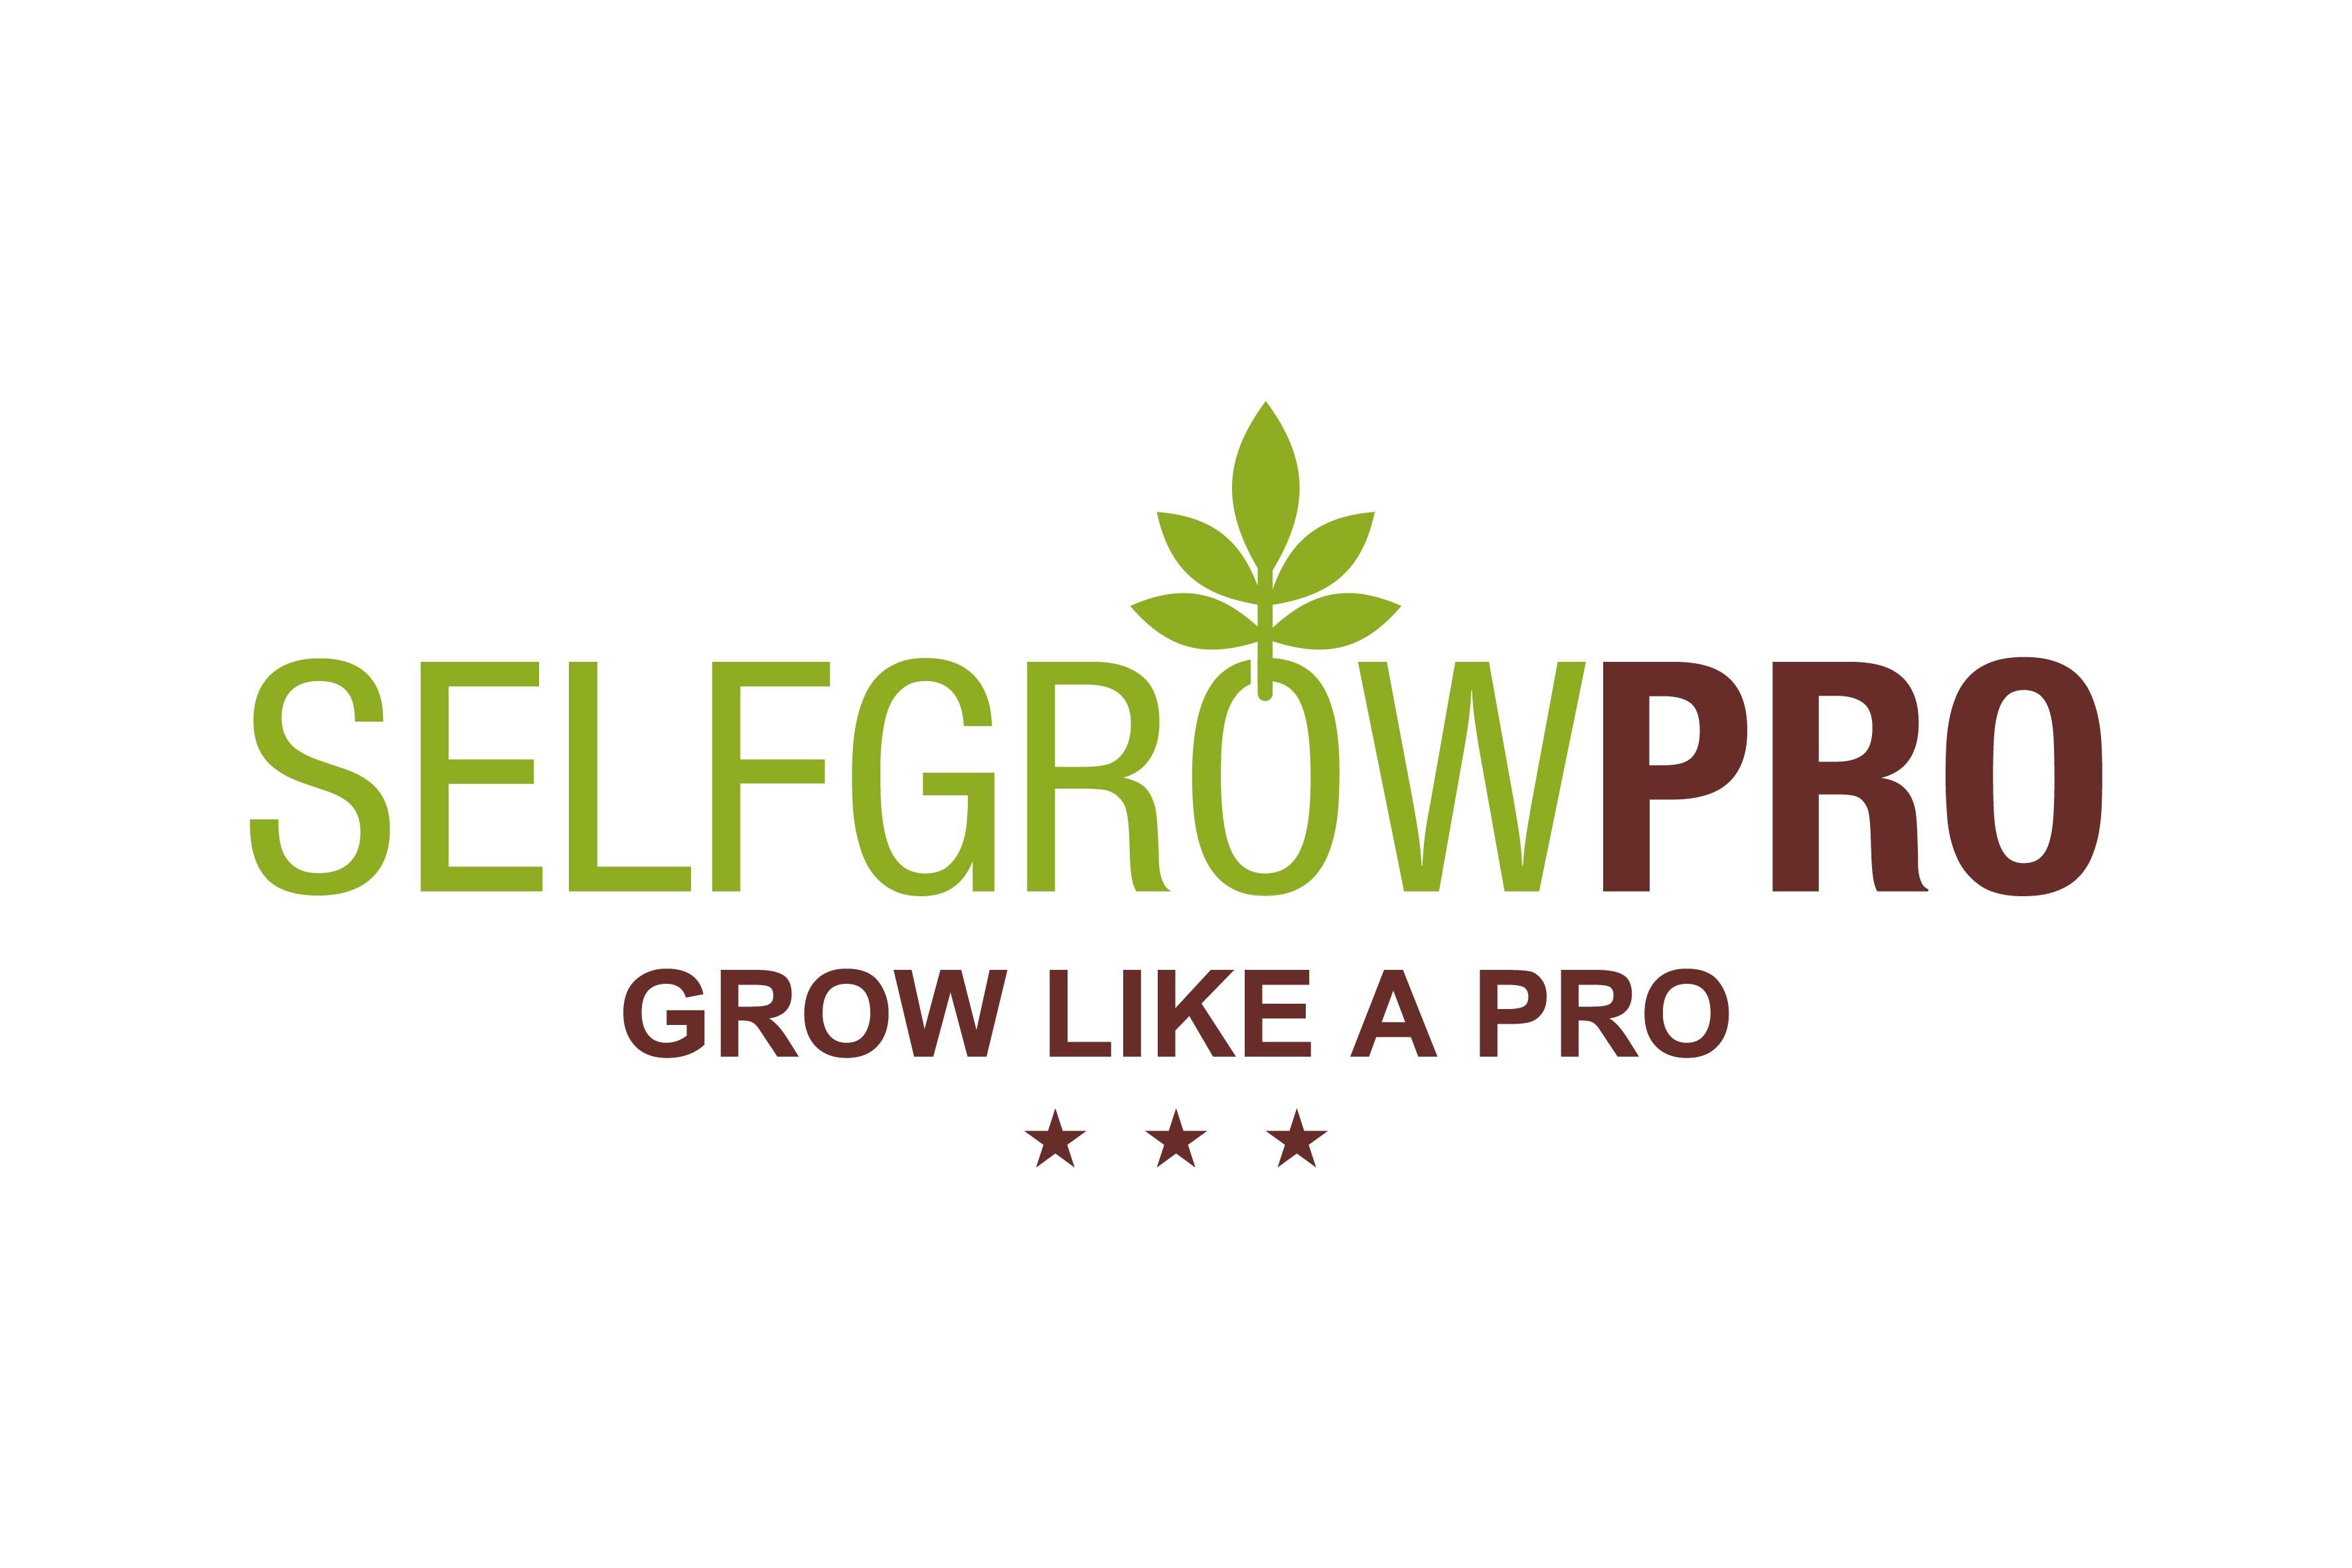 Selfgrowpro